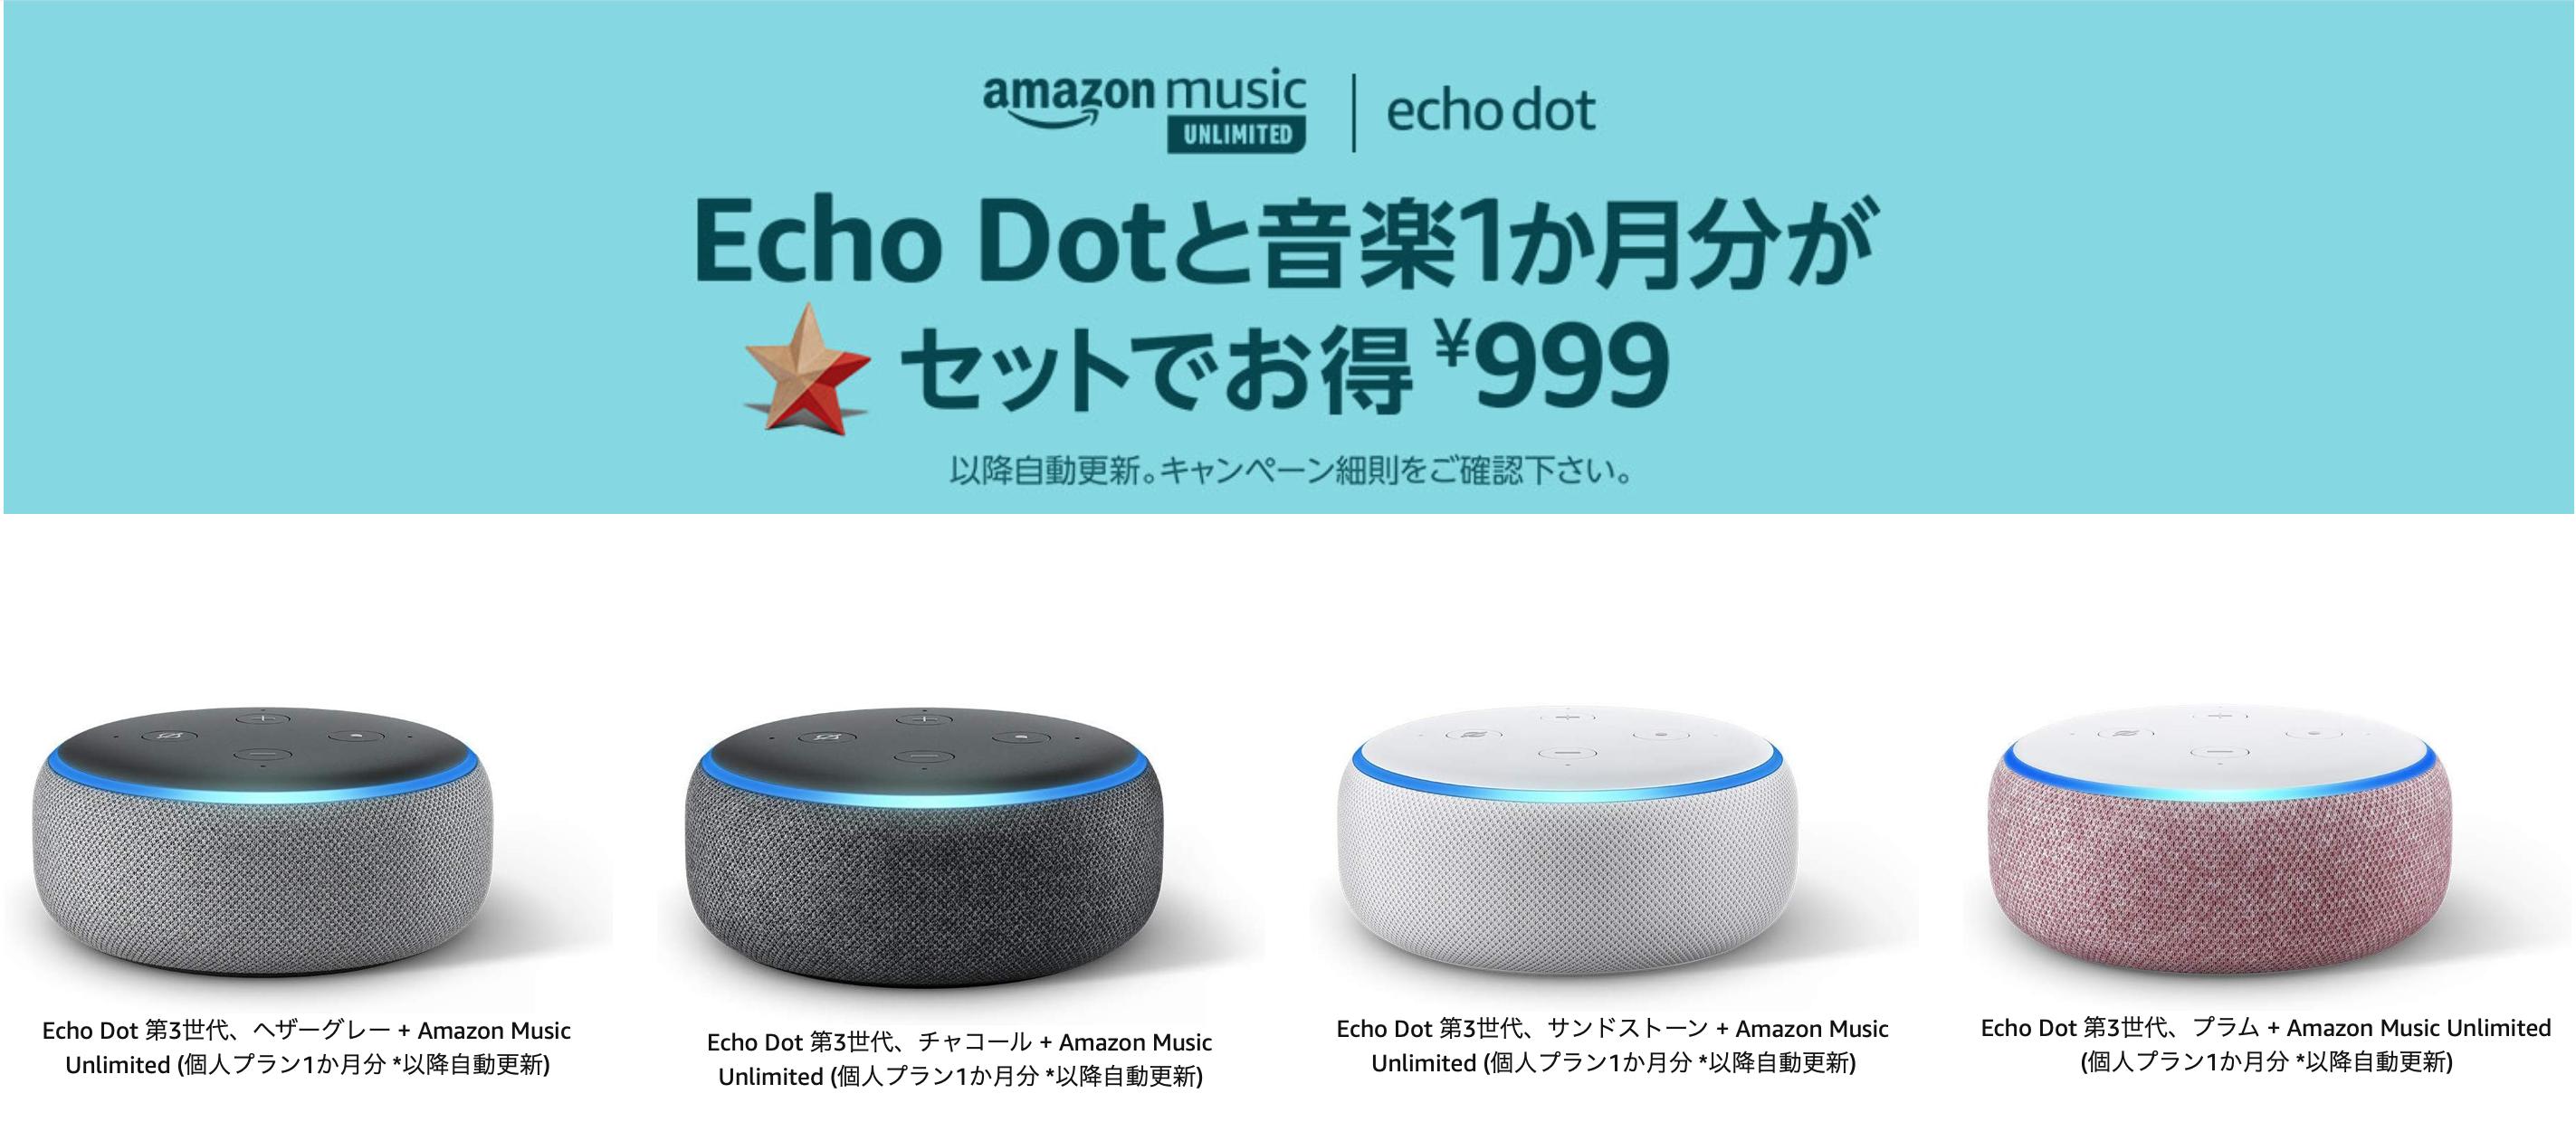 Amazon、Eco Dotが999円で特価販売!Amazon Music Unlimitedとセットで1ヶ月無料になる